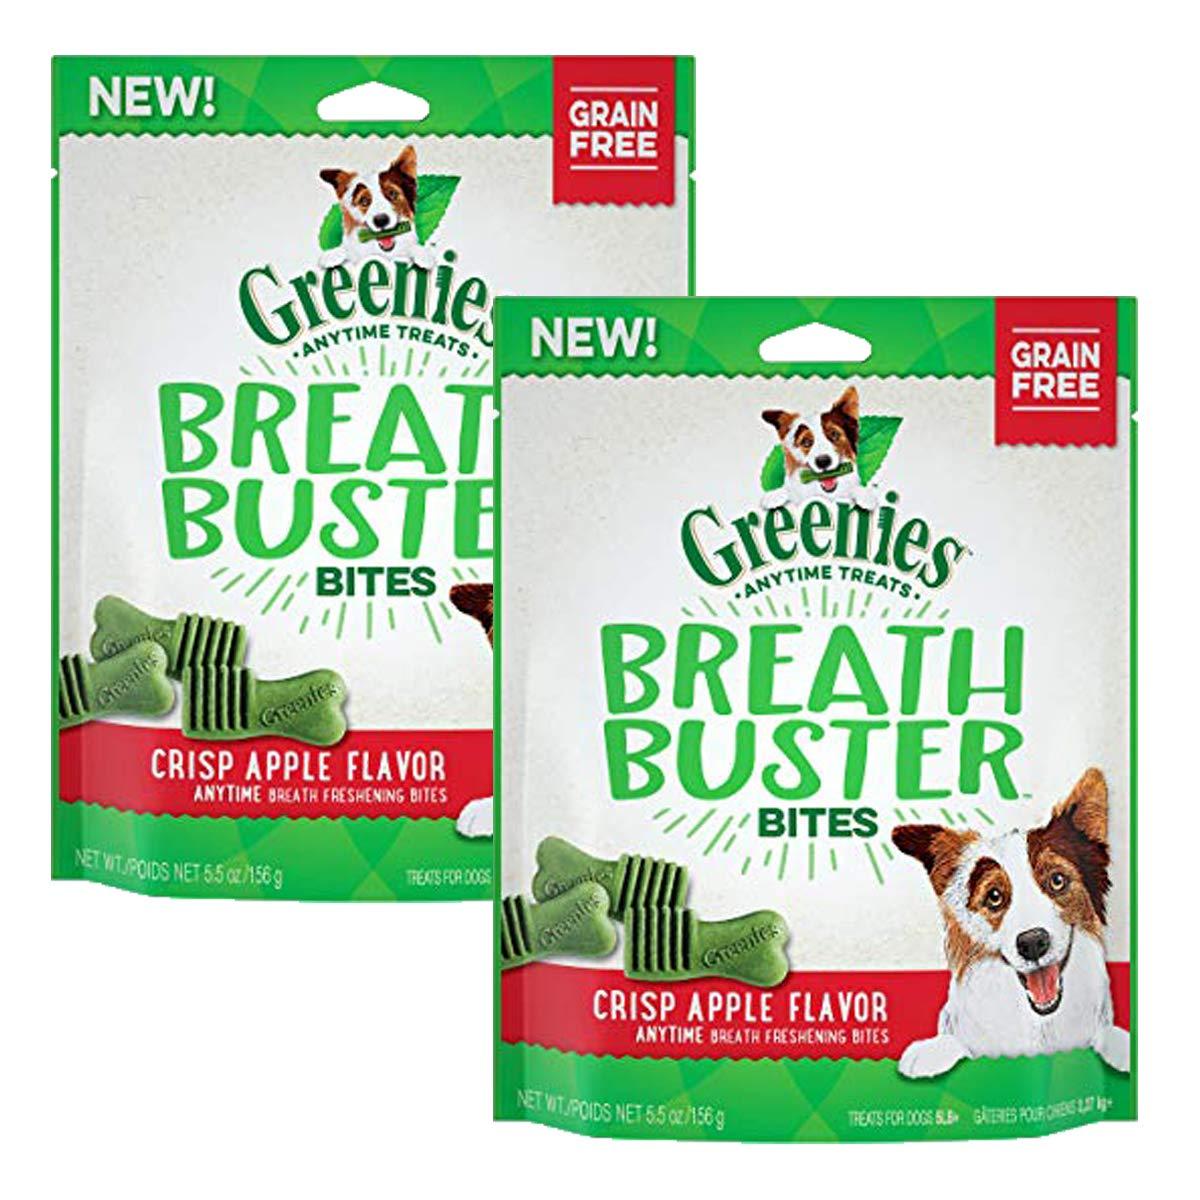 11 oz. Greenies Breath Buster Bites